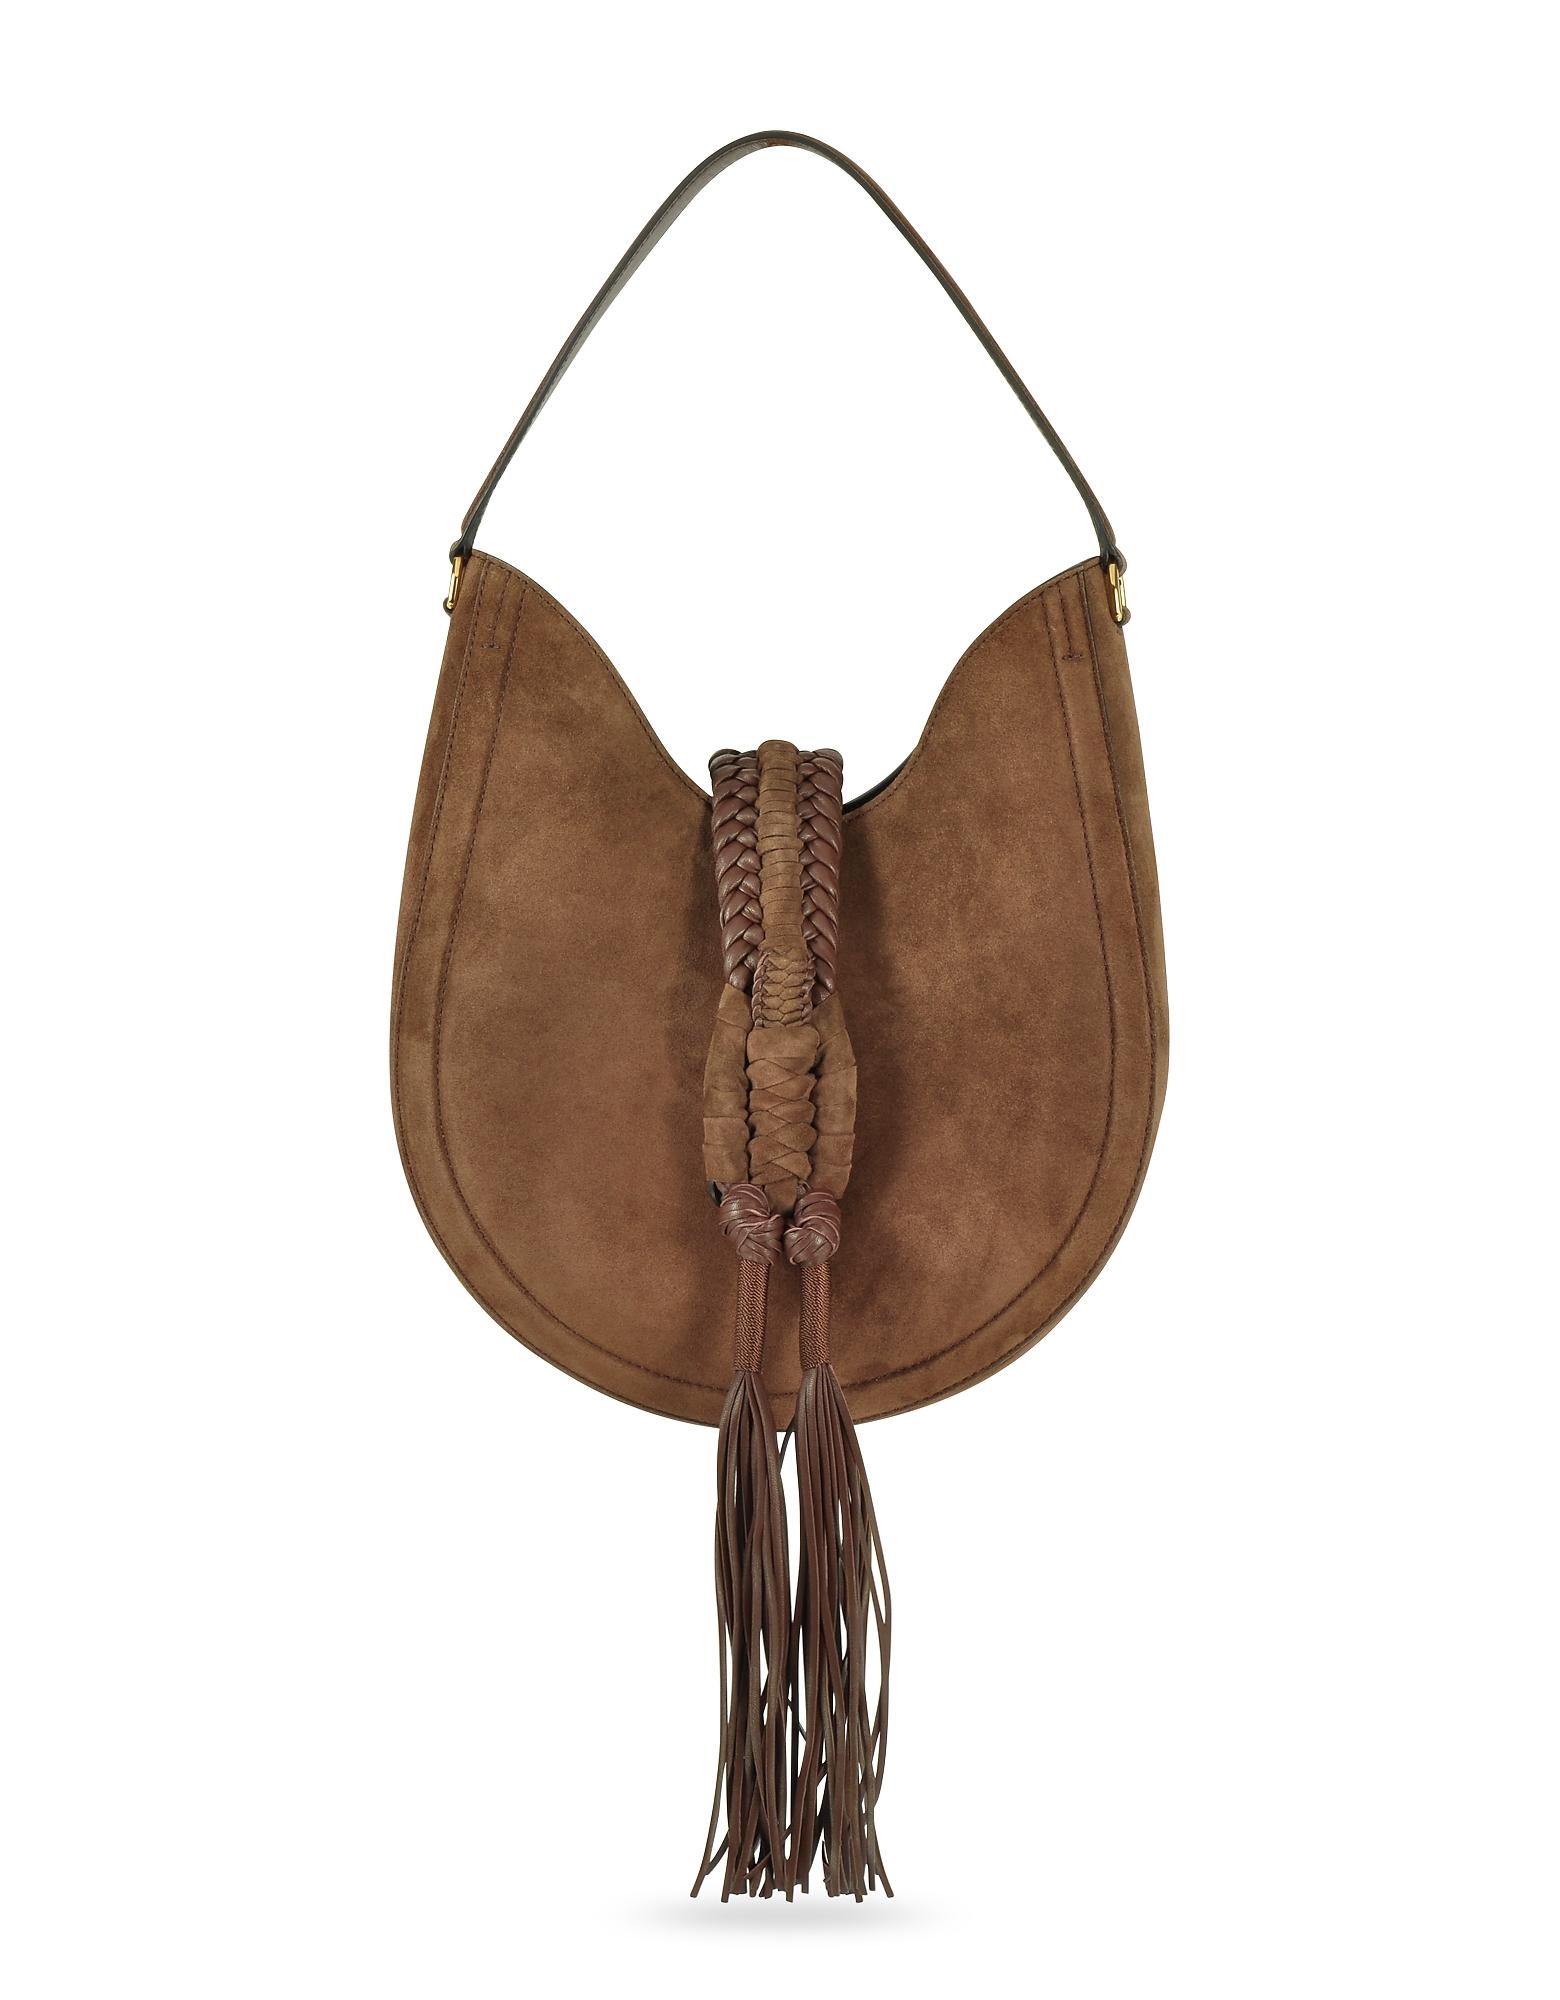 Altuzarra Handbags, Ghianda Small Chocolate Suede Knot Hobo Bag